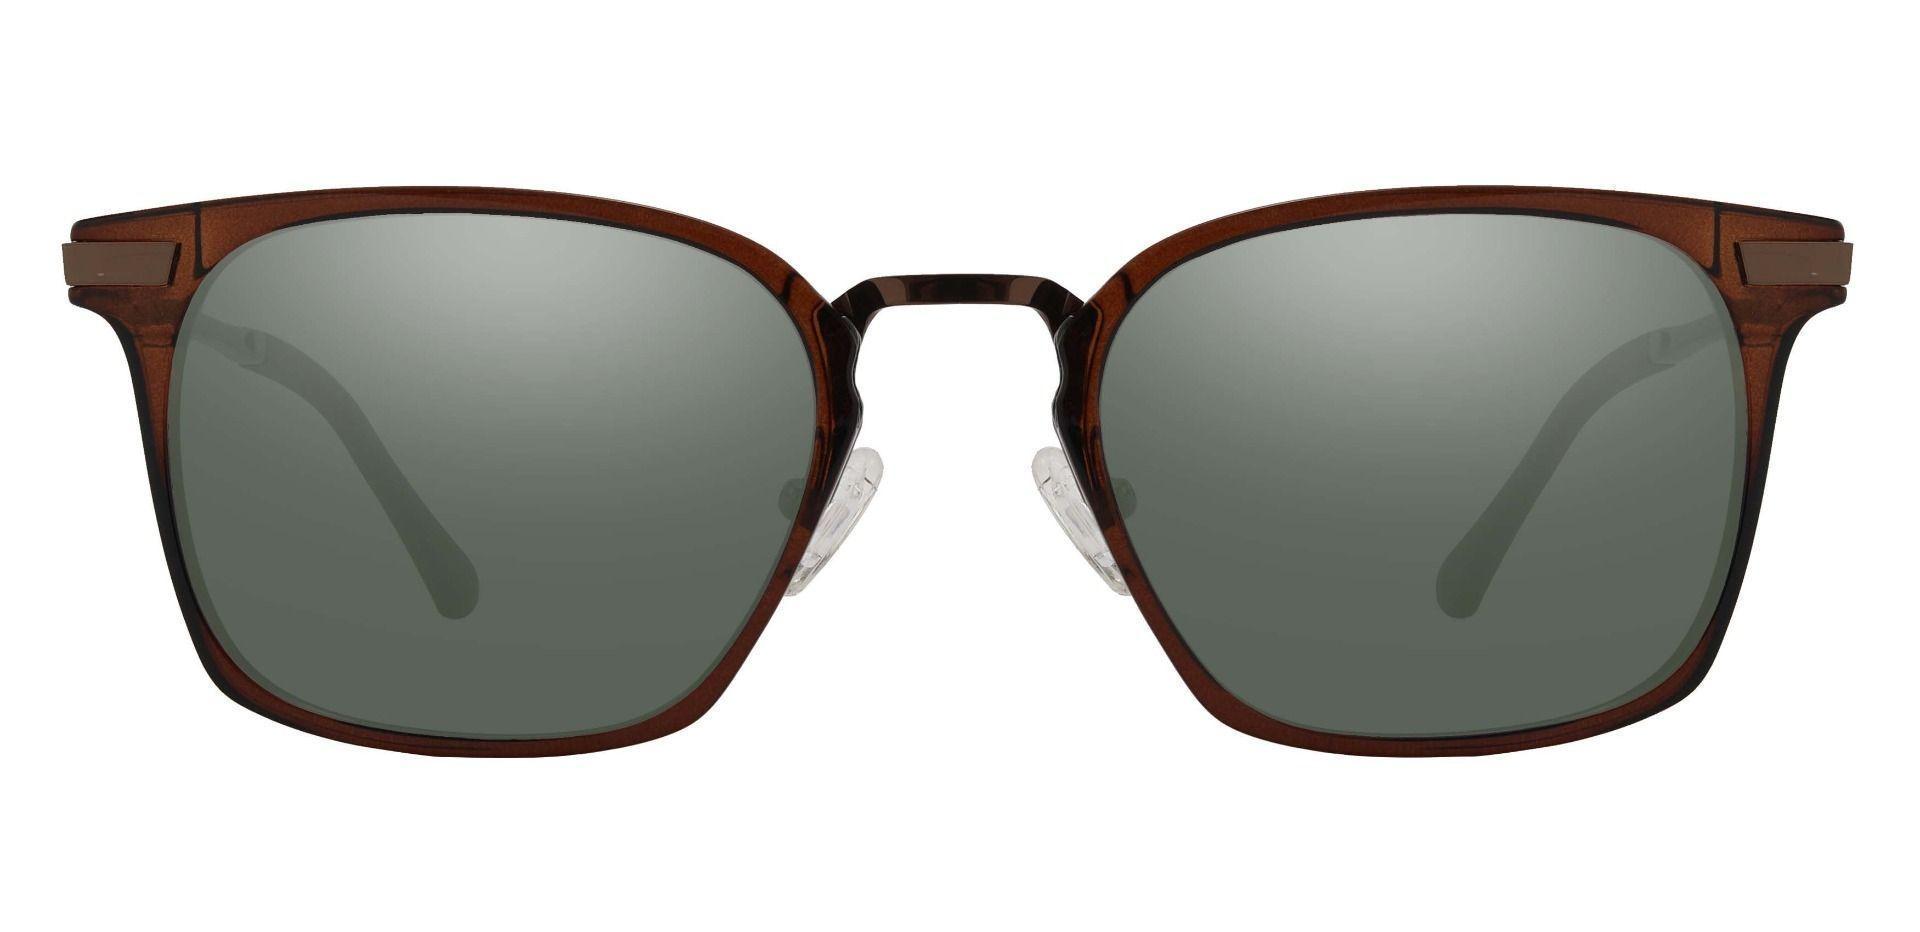 Jefferson Rectangle Prescription Sunglasses - Brown Frame With Green Lenses